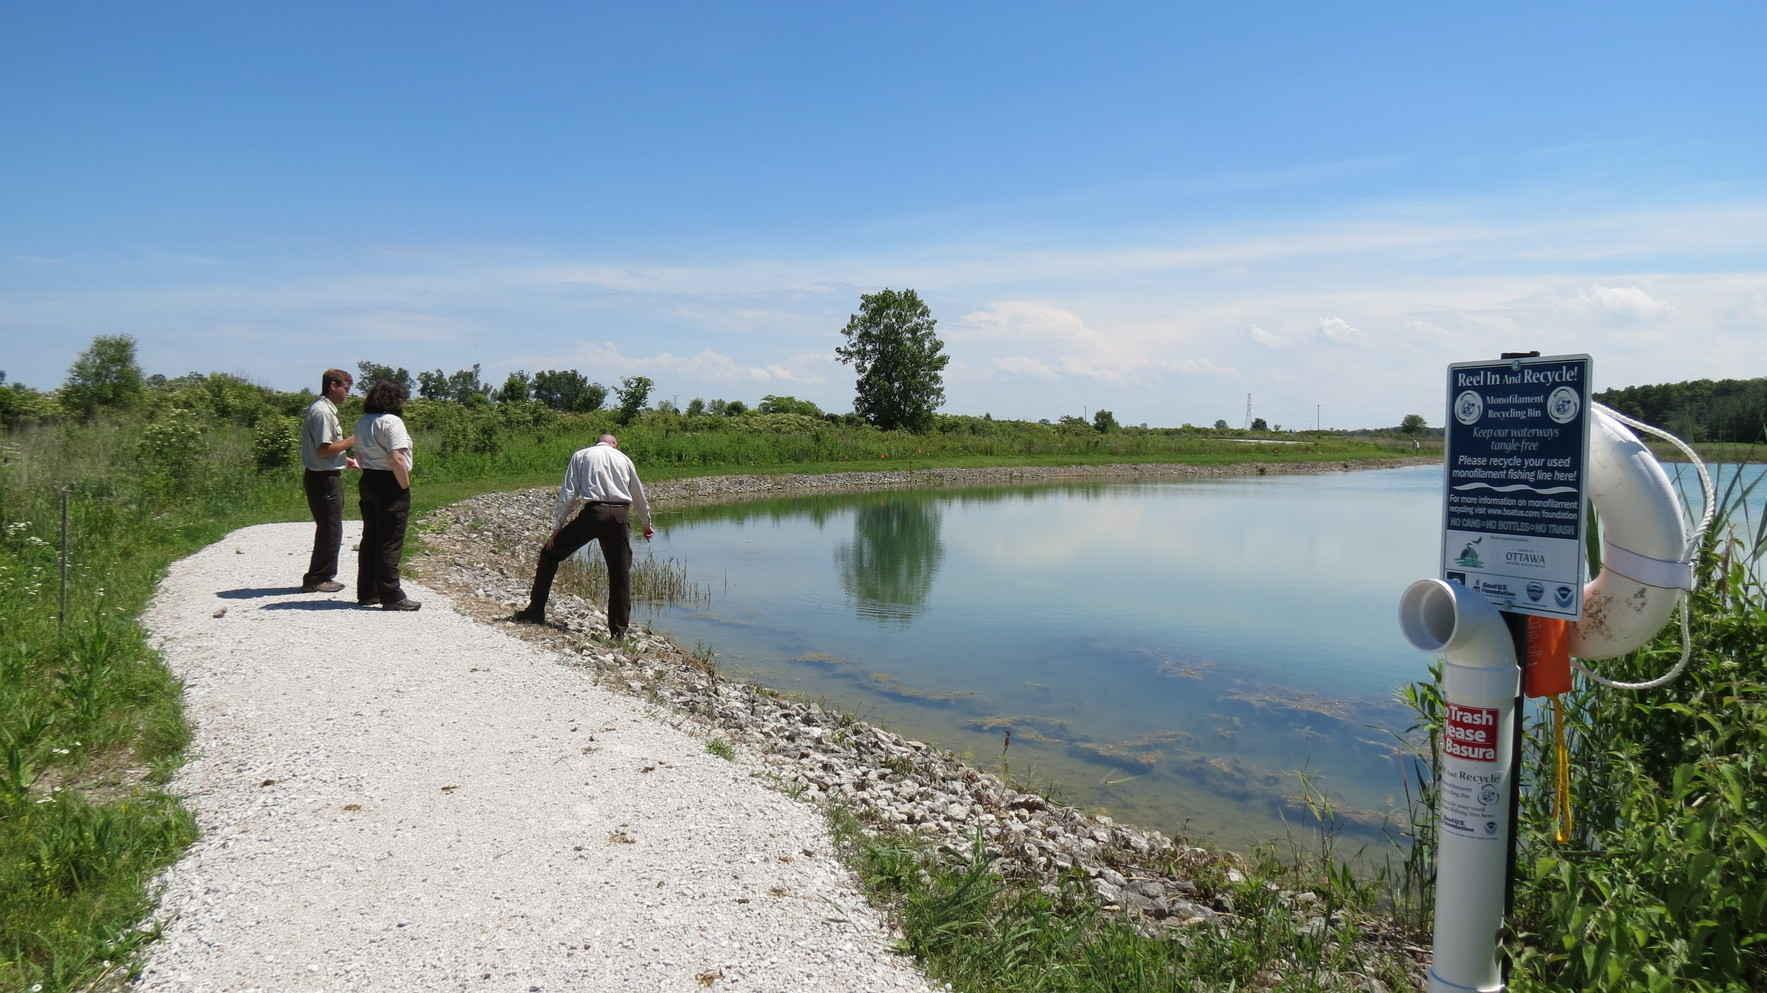 Help fund the youth fishing access at Ottawa National Wildlife Refuge image